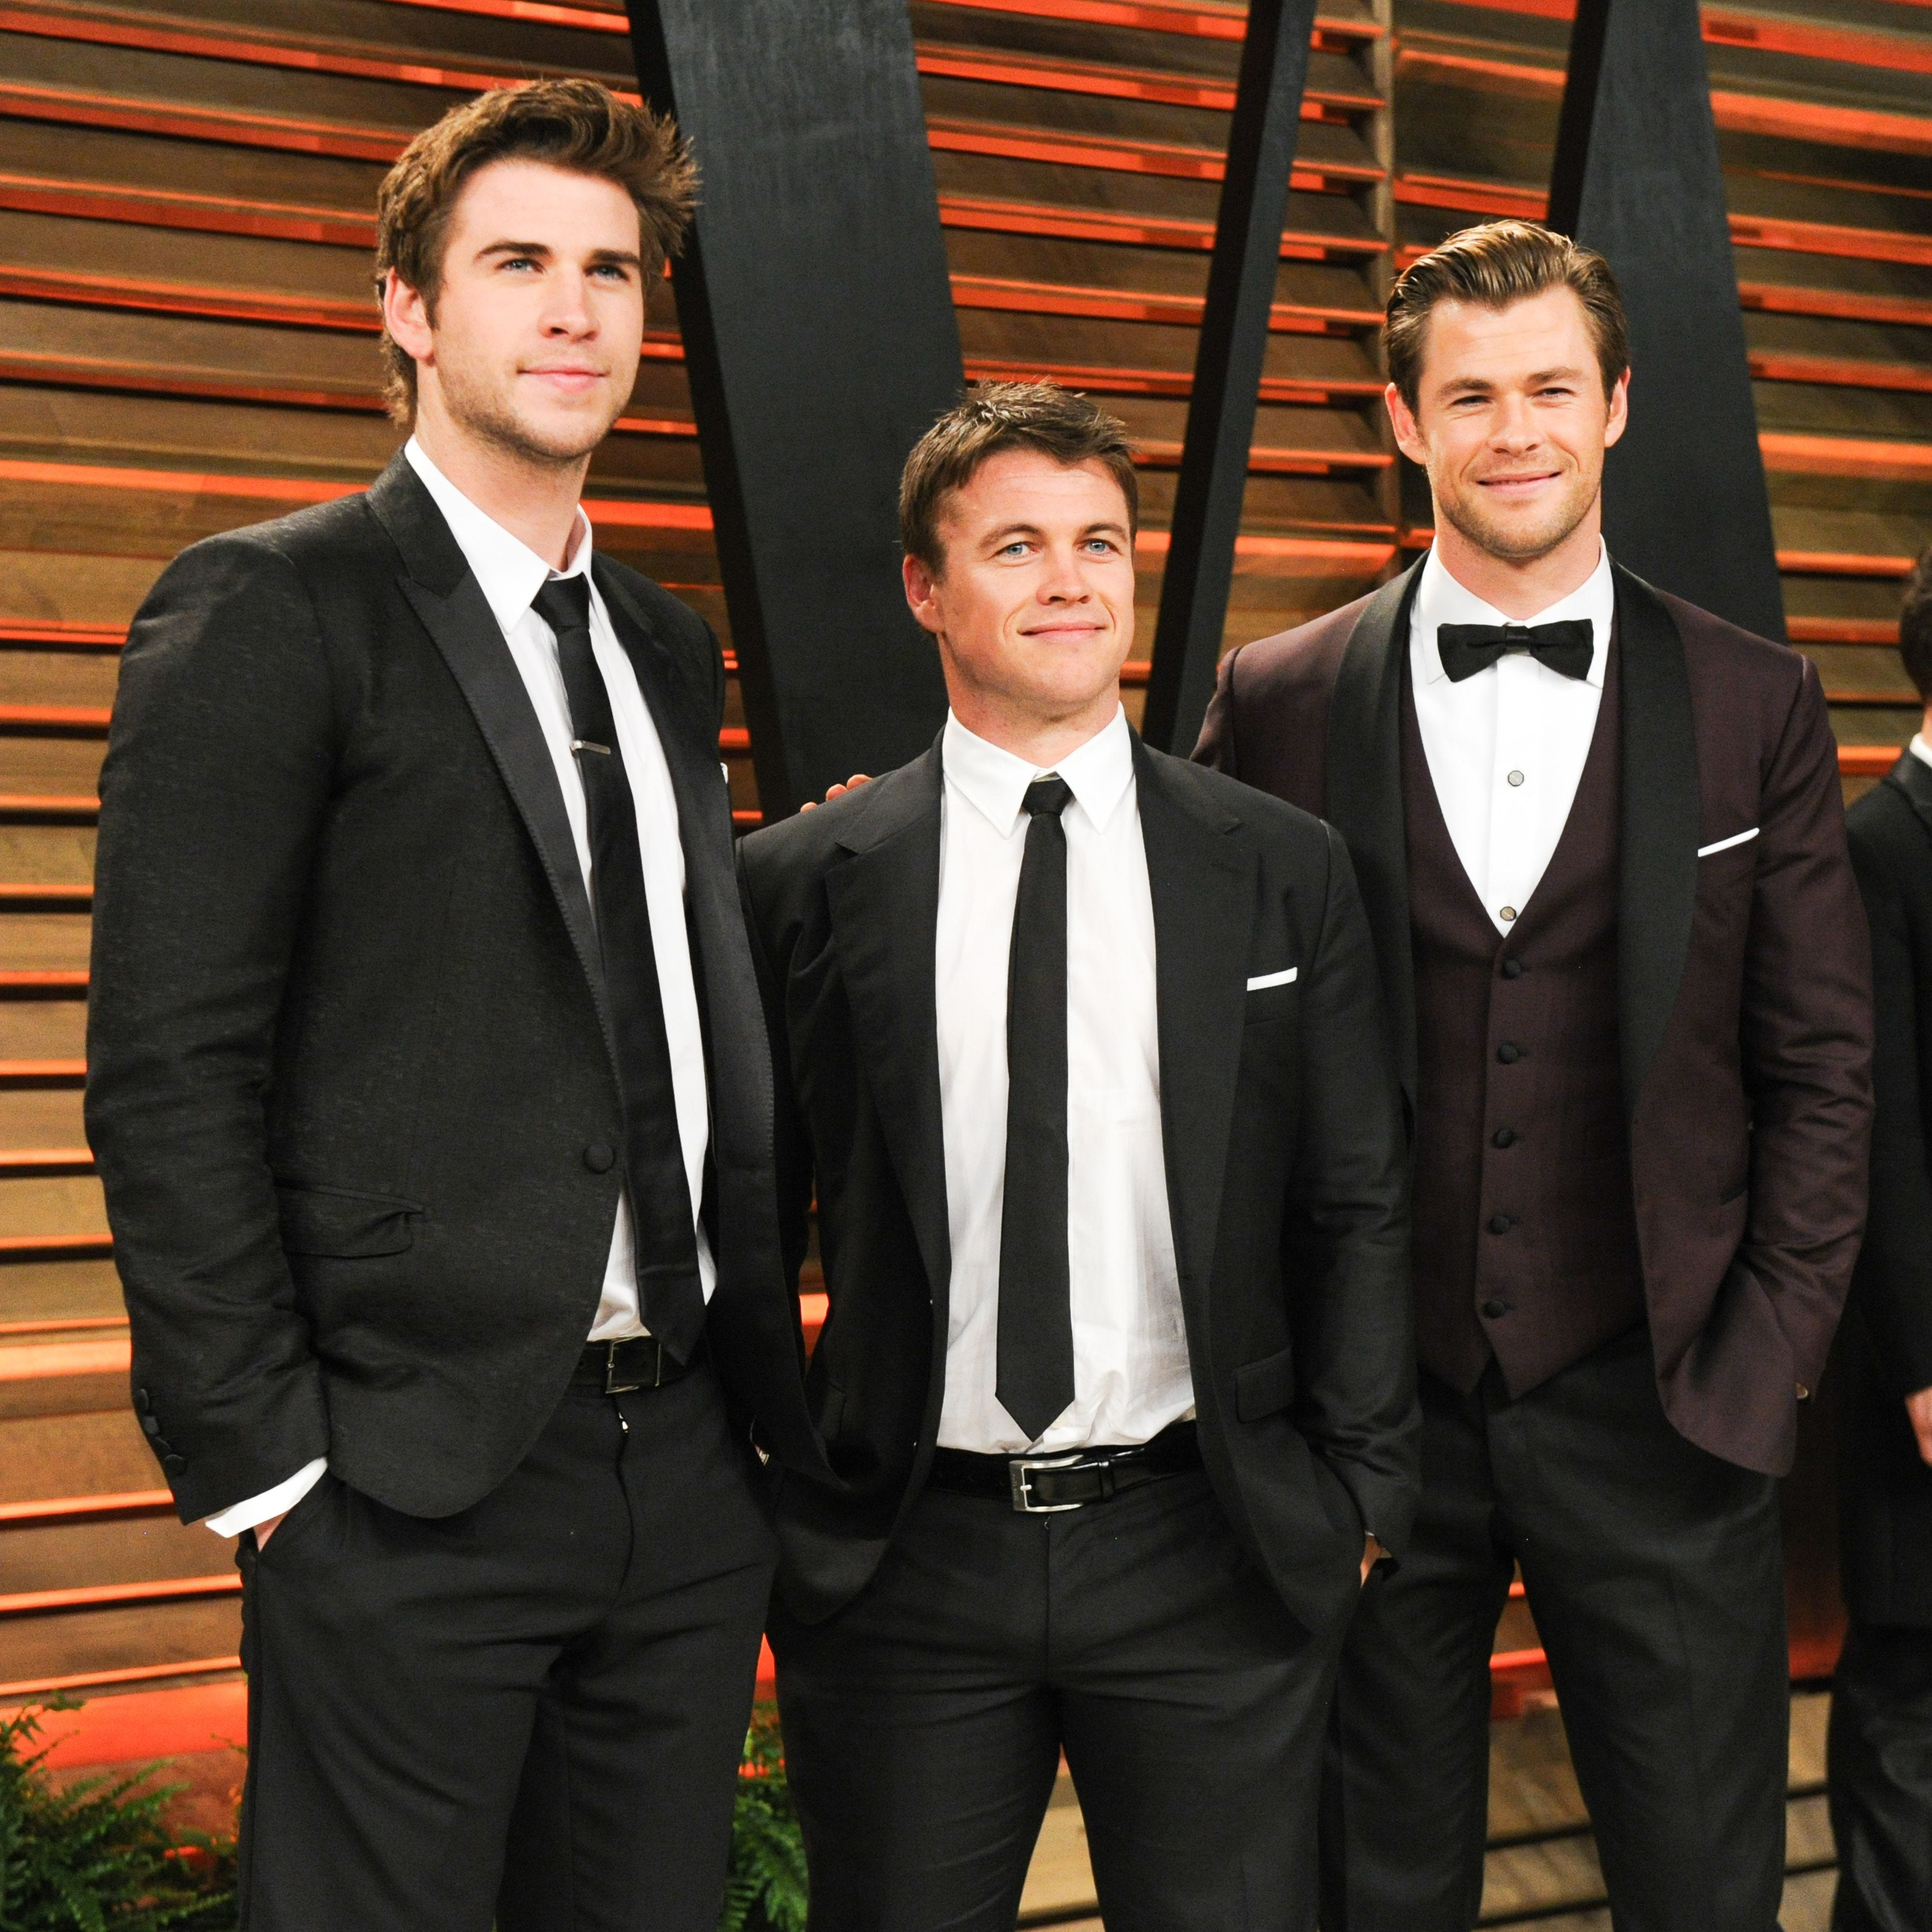 Hemsworth Brothers Family Tree: Chris, Liam, Luke Ages